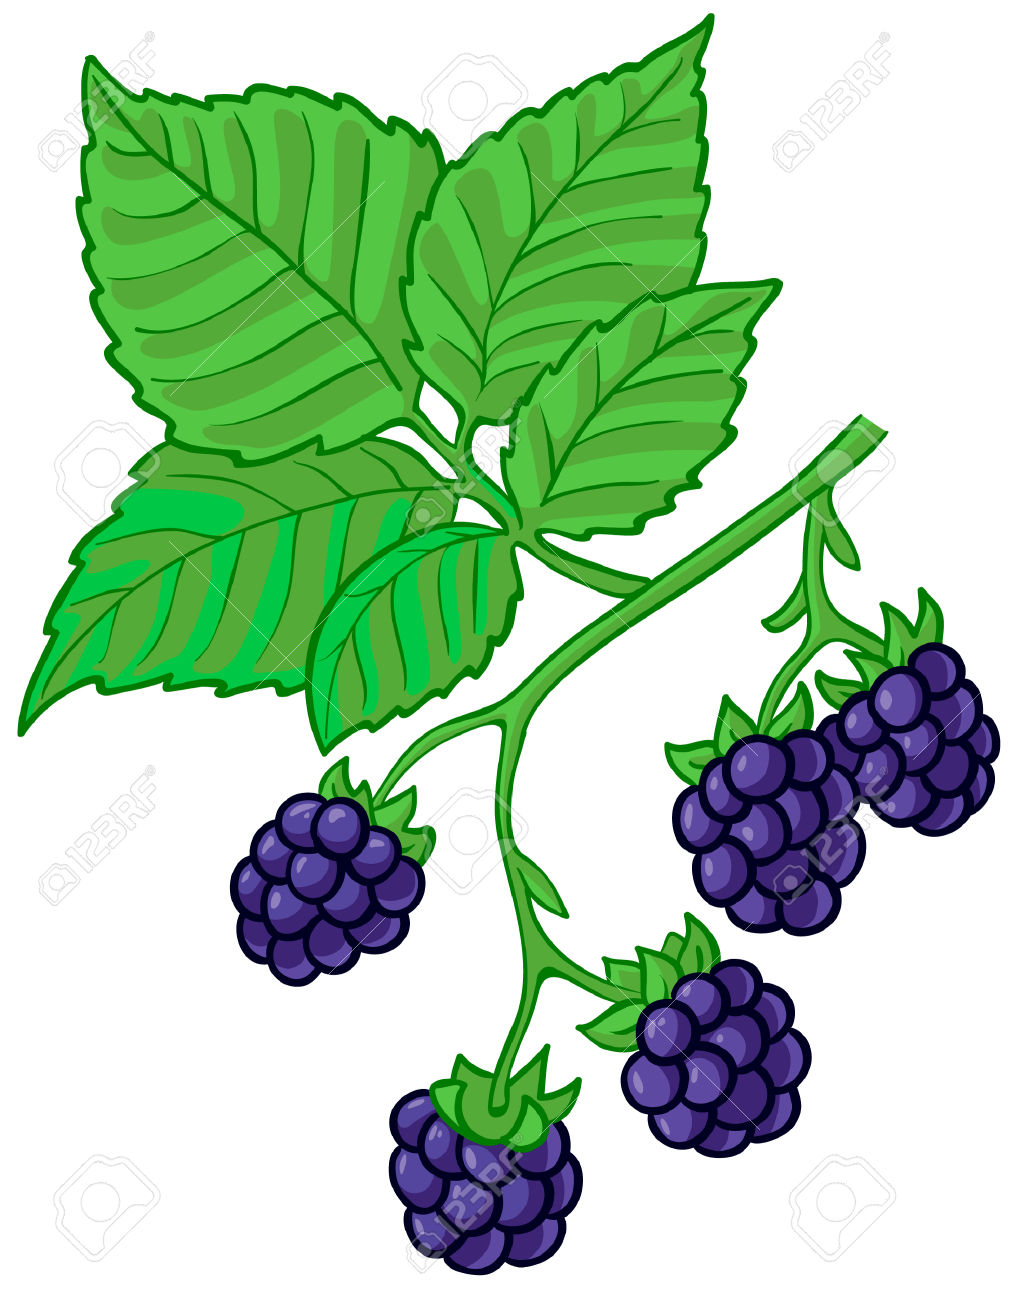 Berries clipart vector. Berry blackberry bush pencil